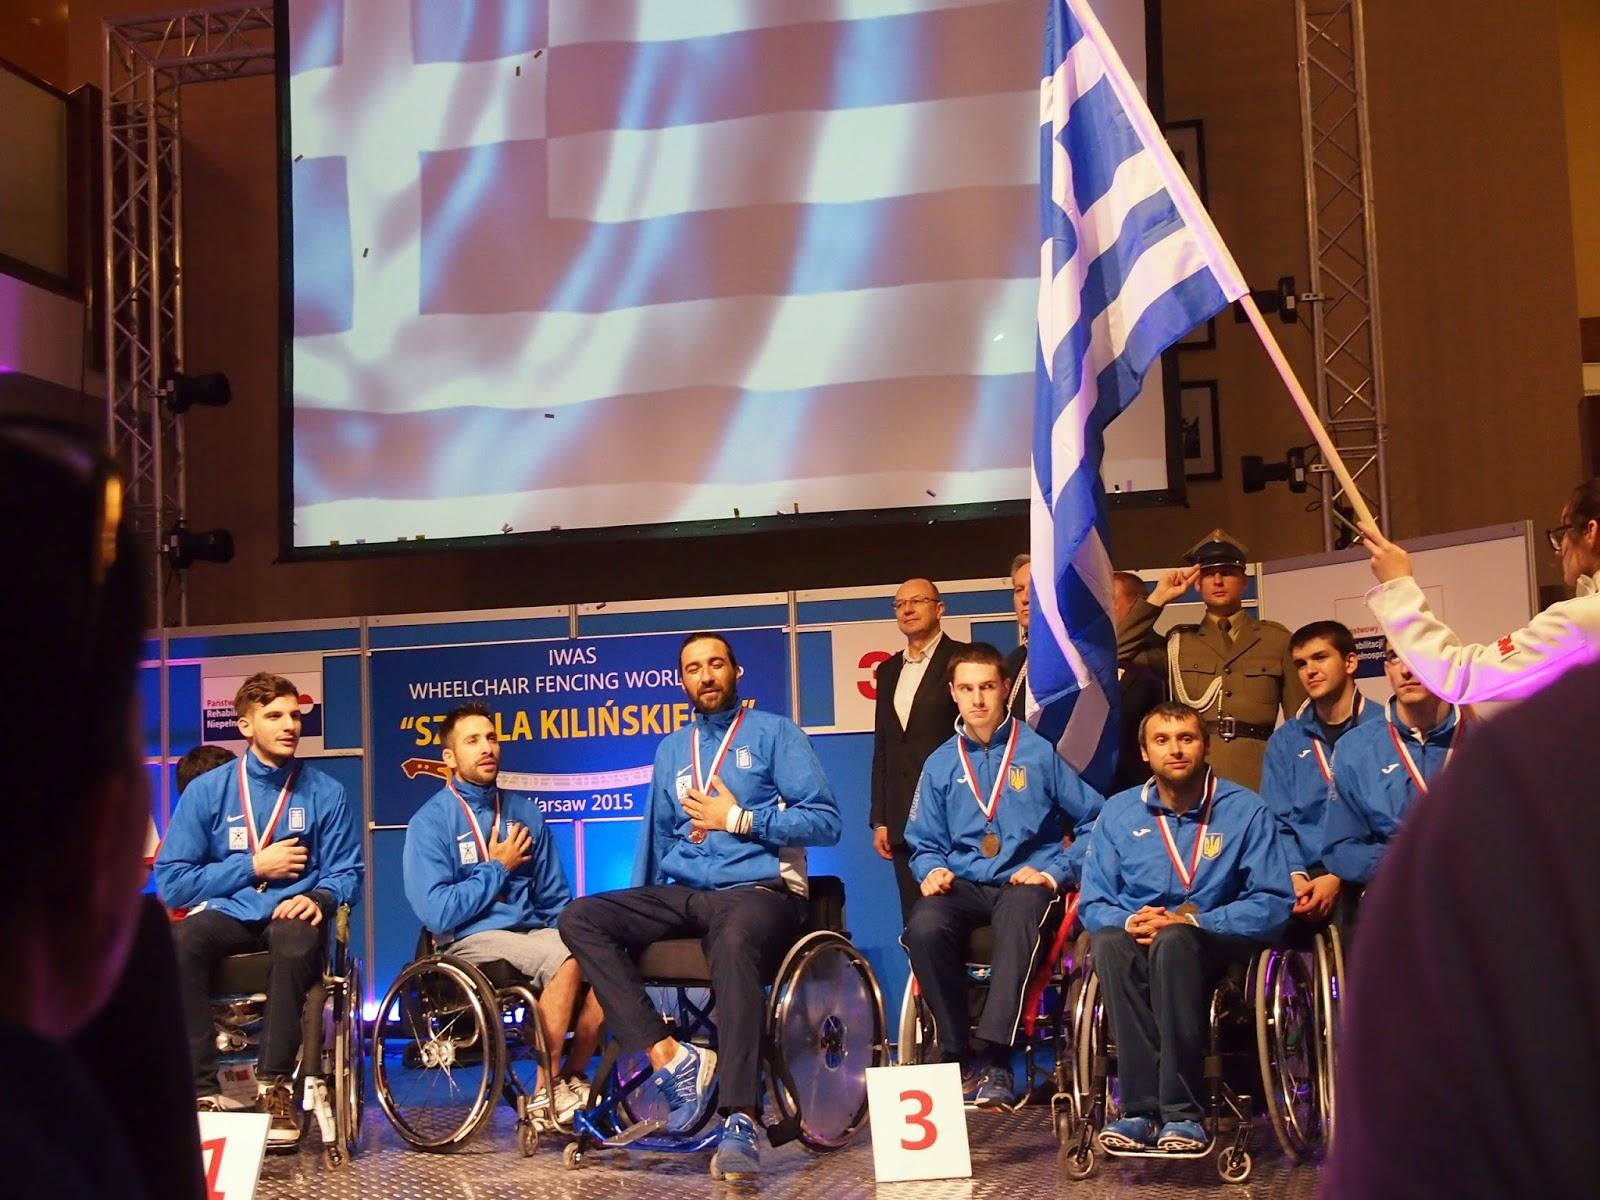 wheelchairfencing02